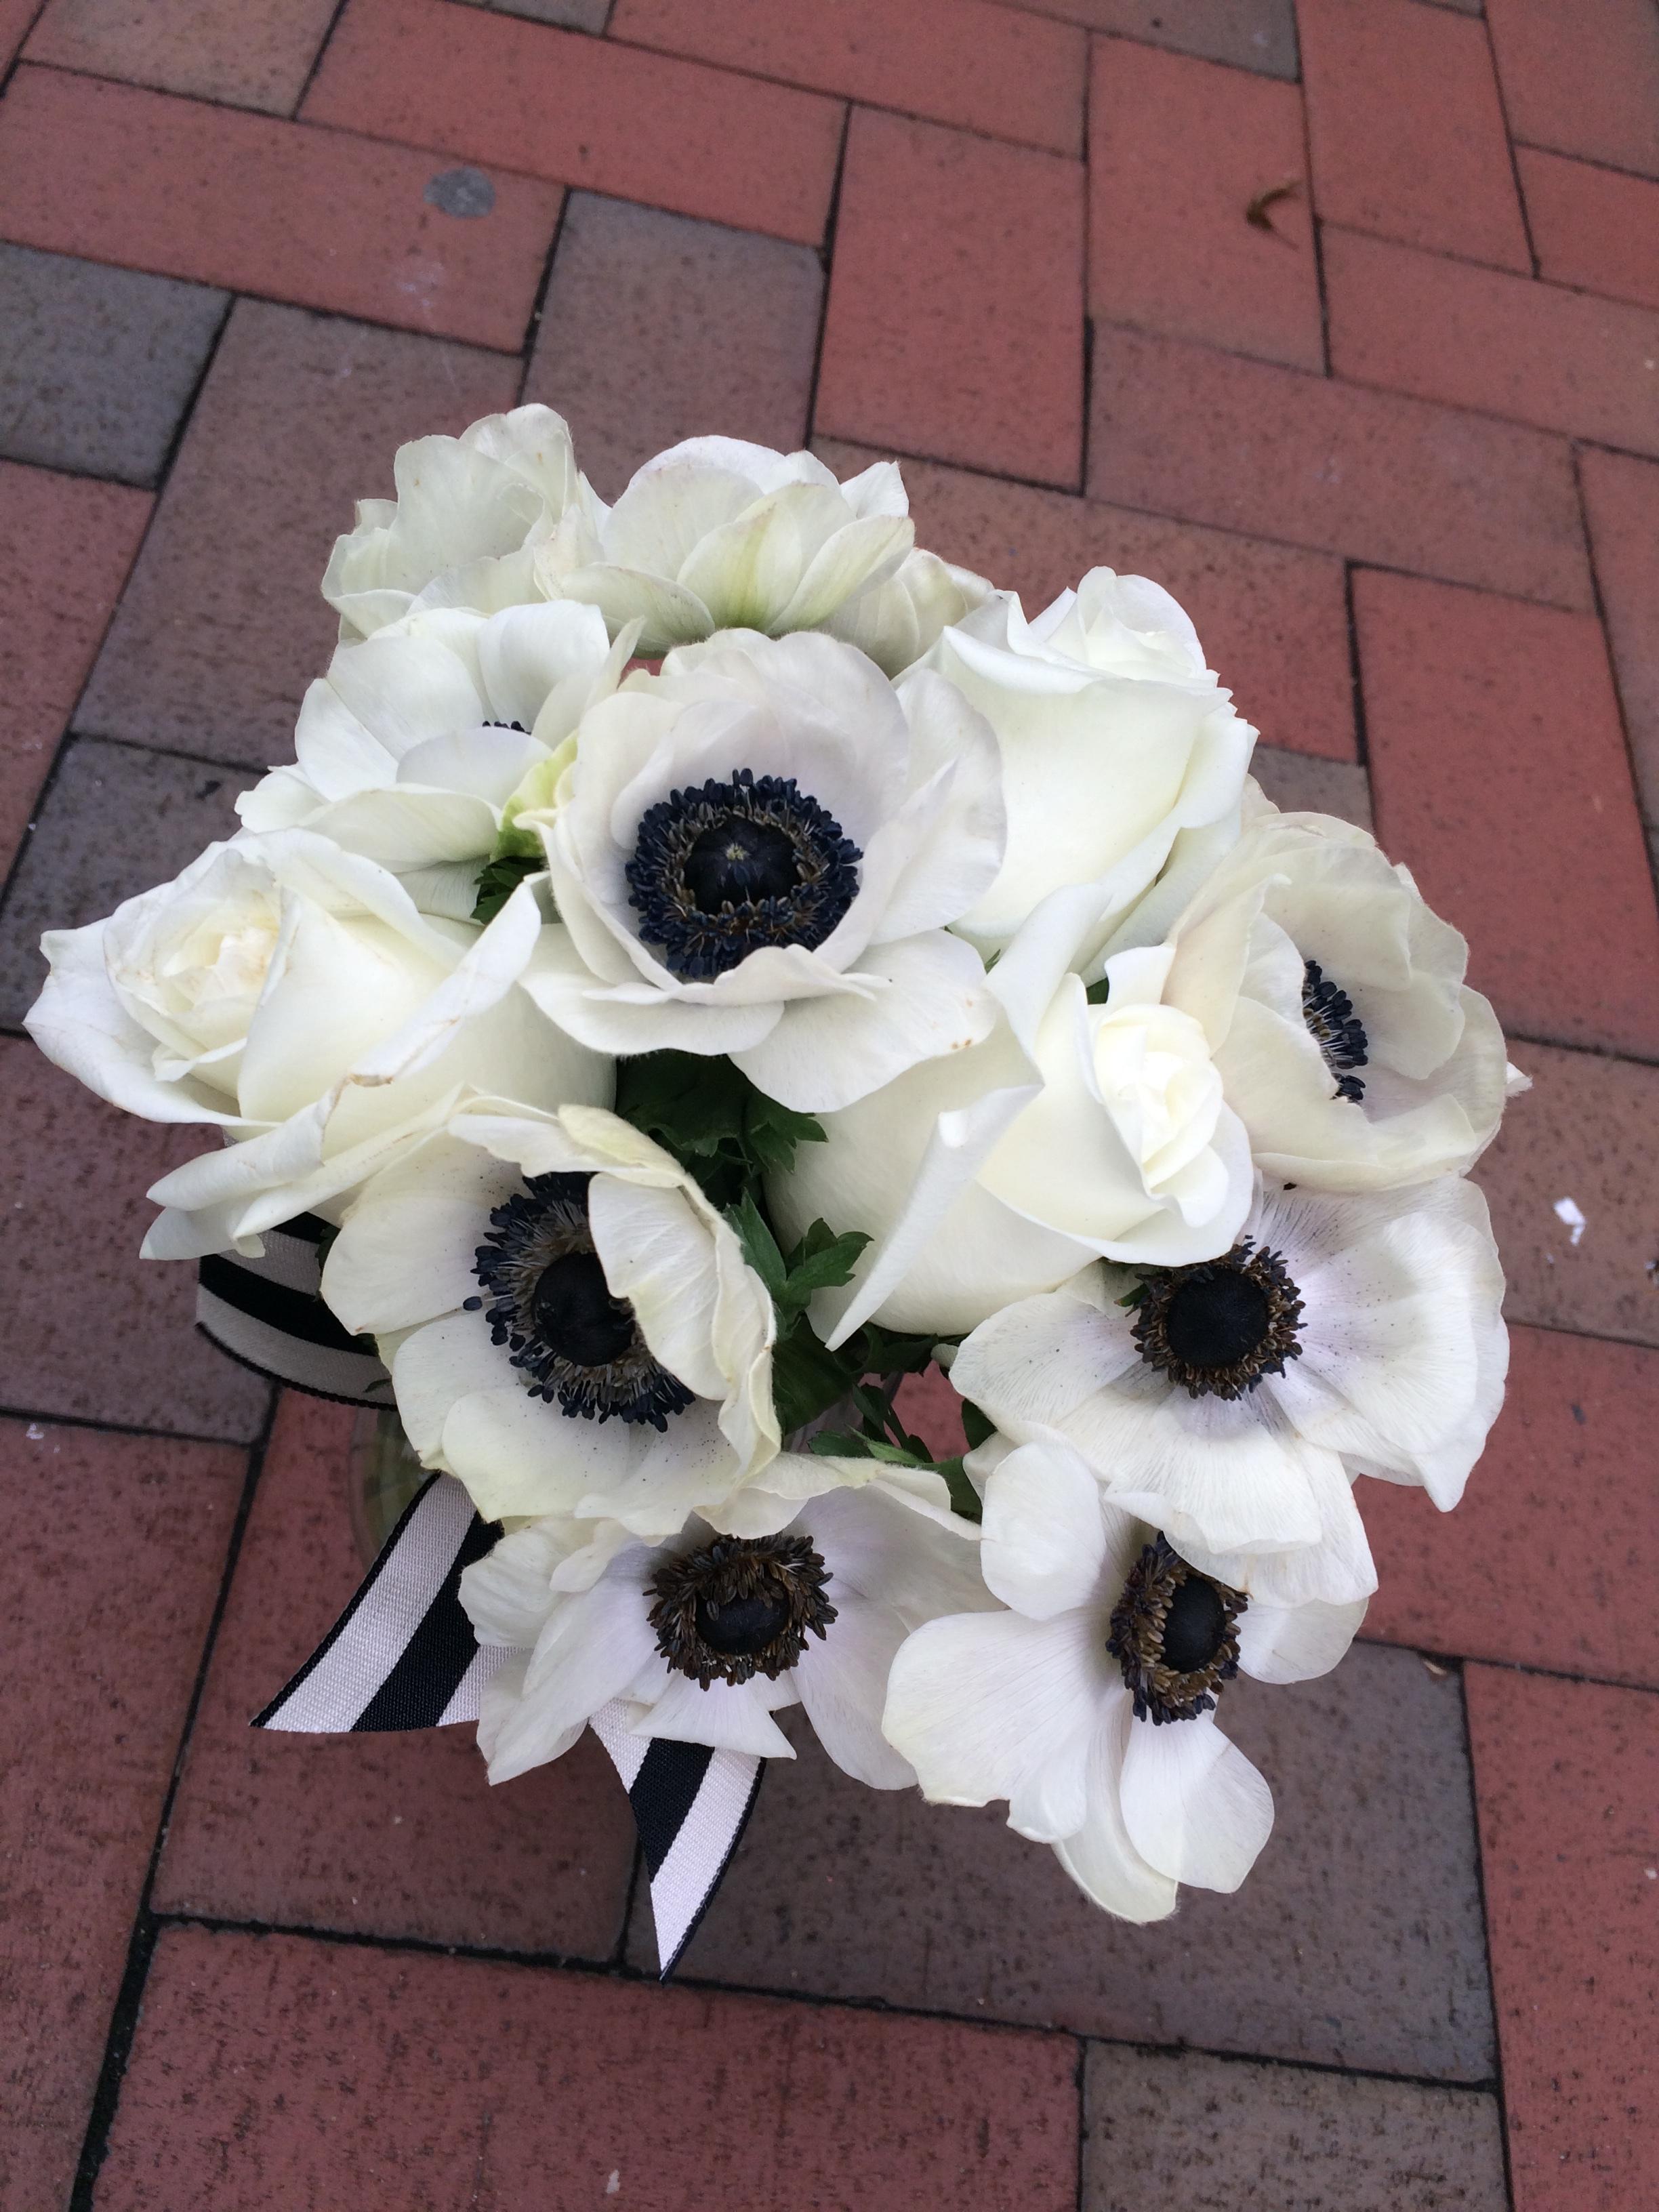 bloom brigade florist - wedding bouquet